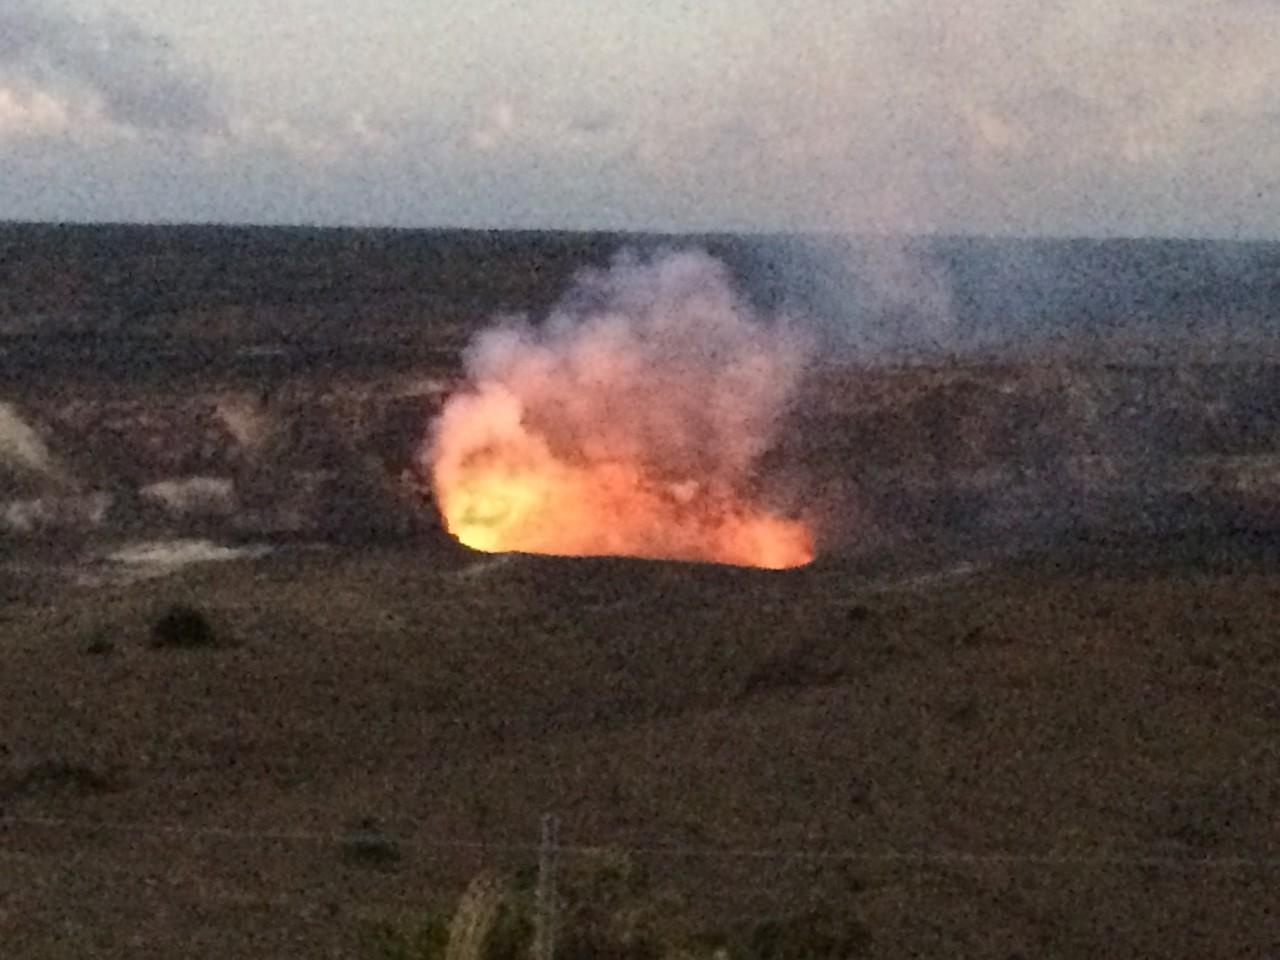 Kilauea caldera and lava lake, Hawaii